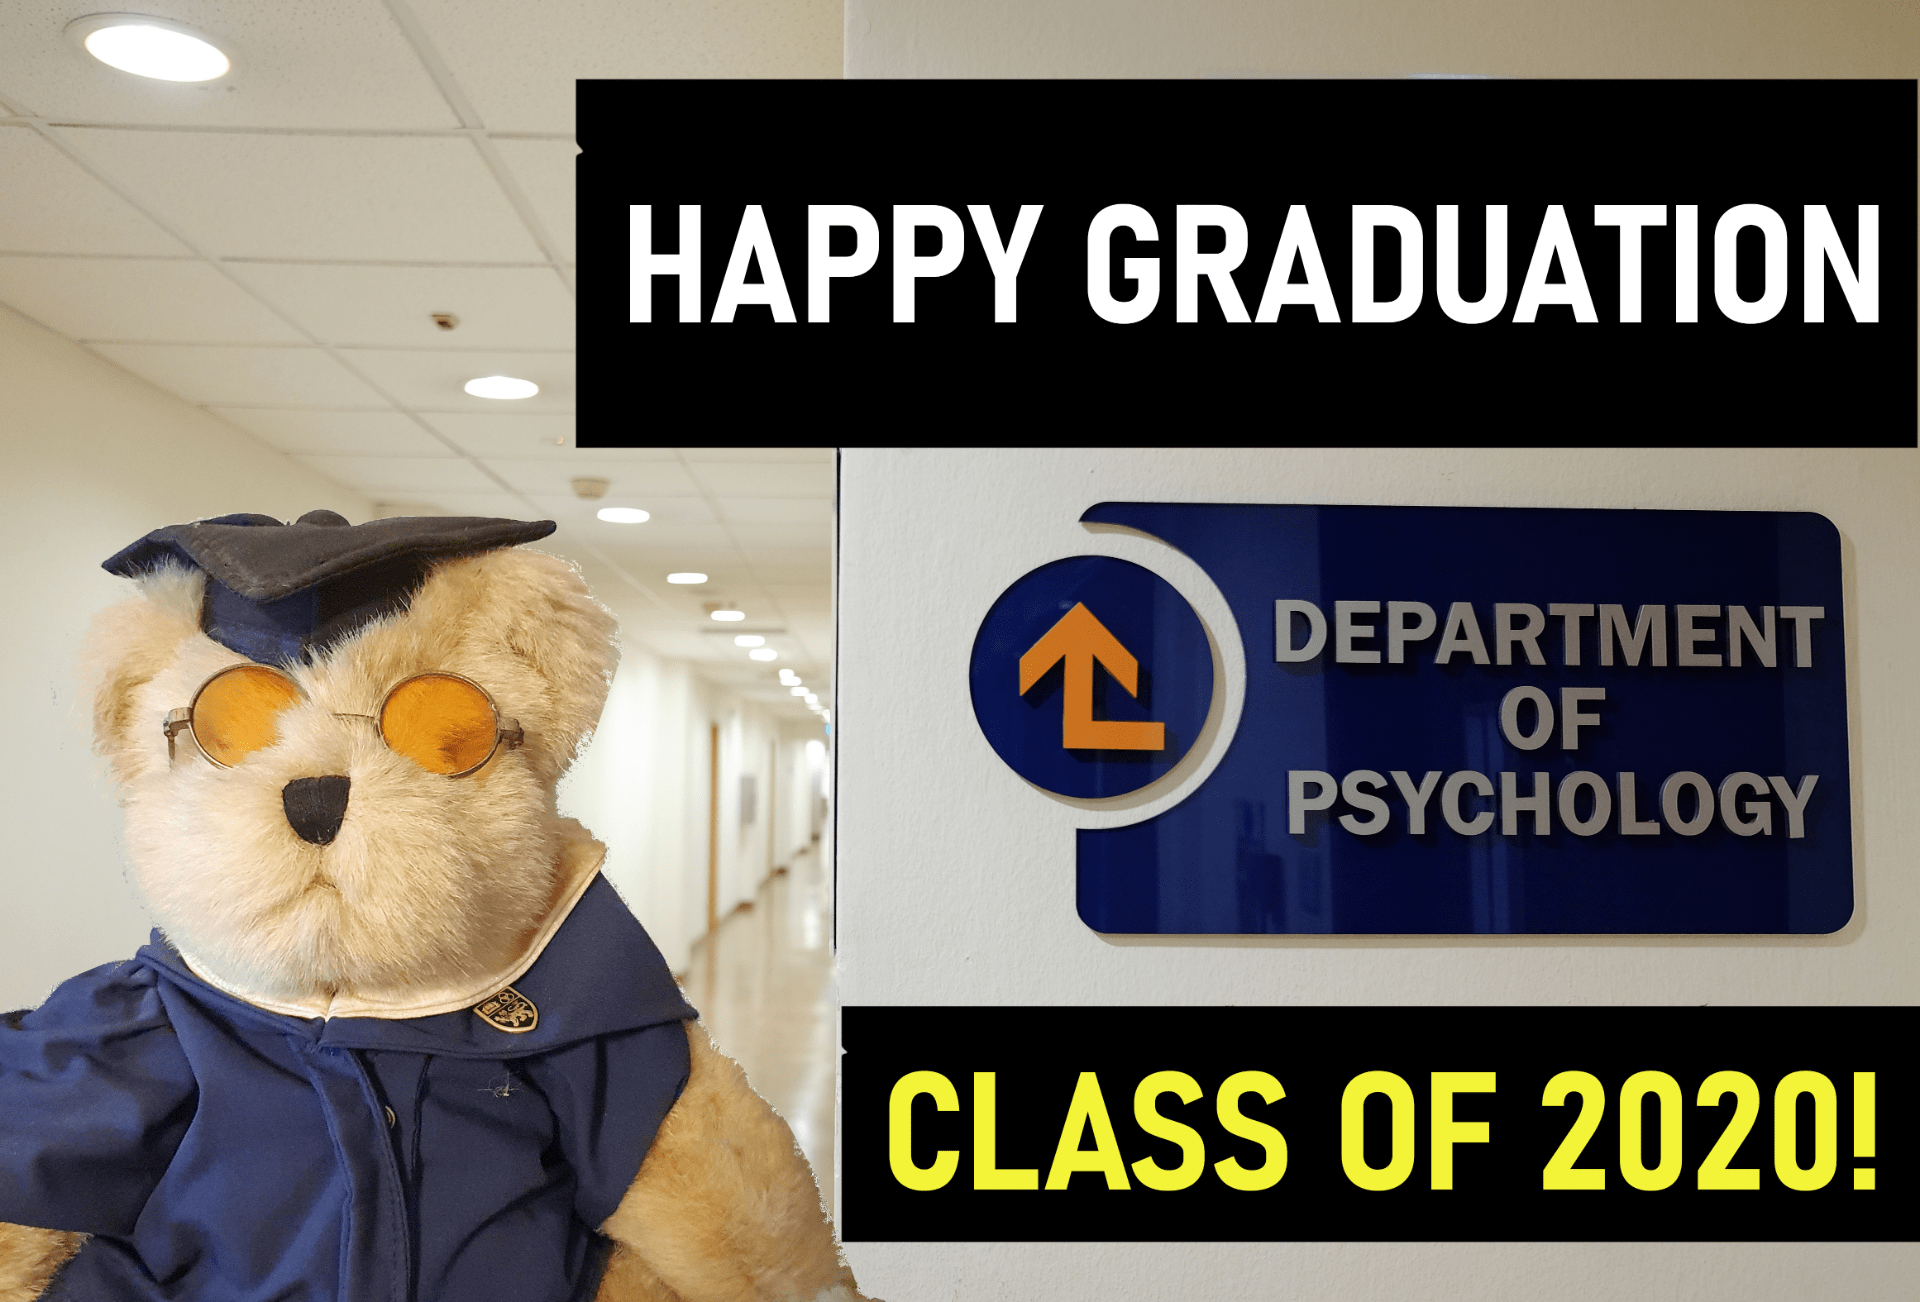 Happy Graduation, Class of 2020!